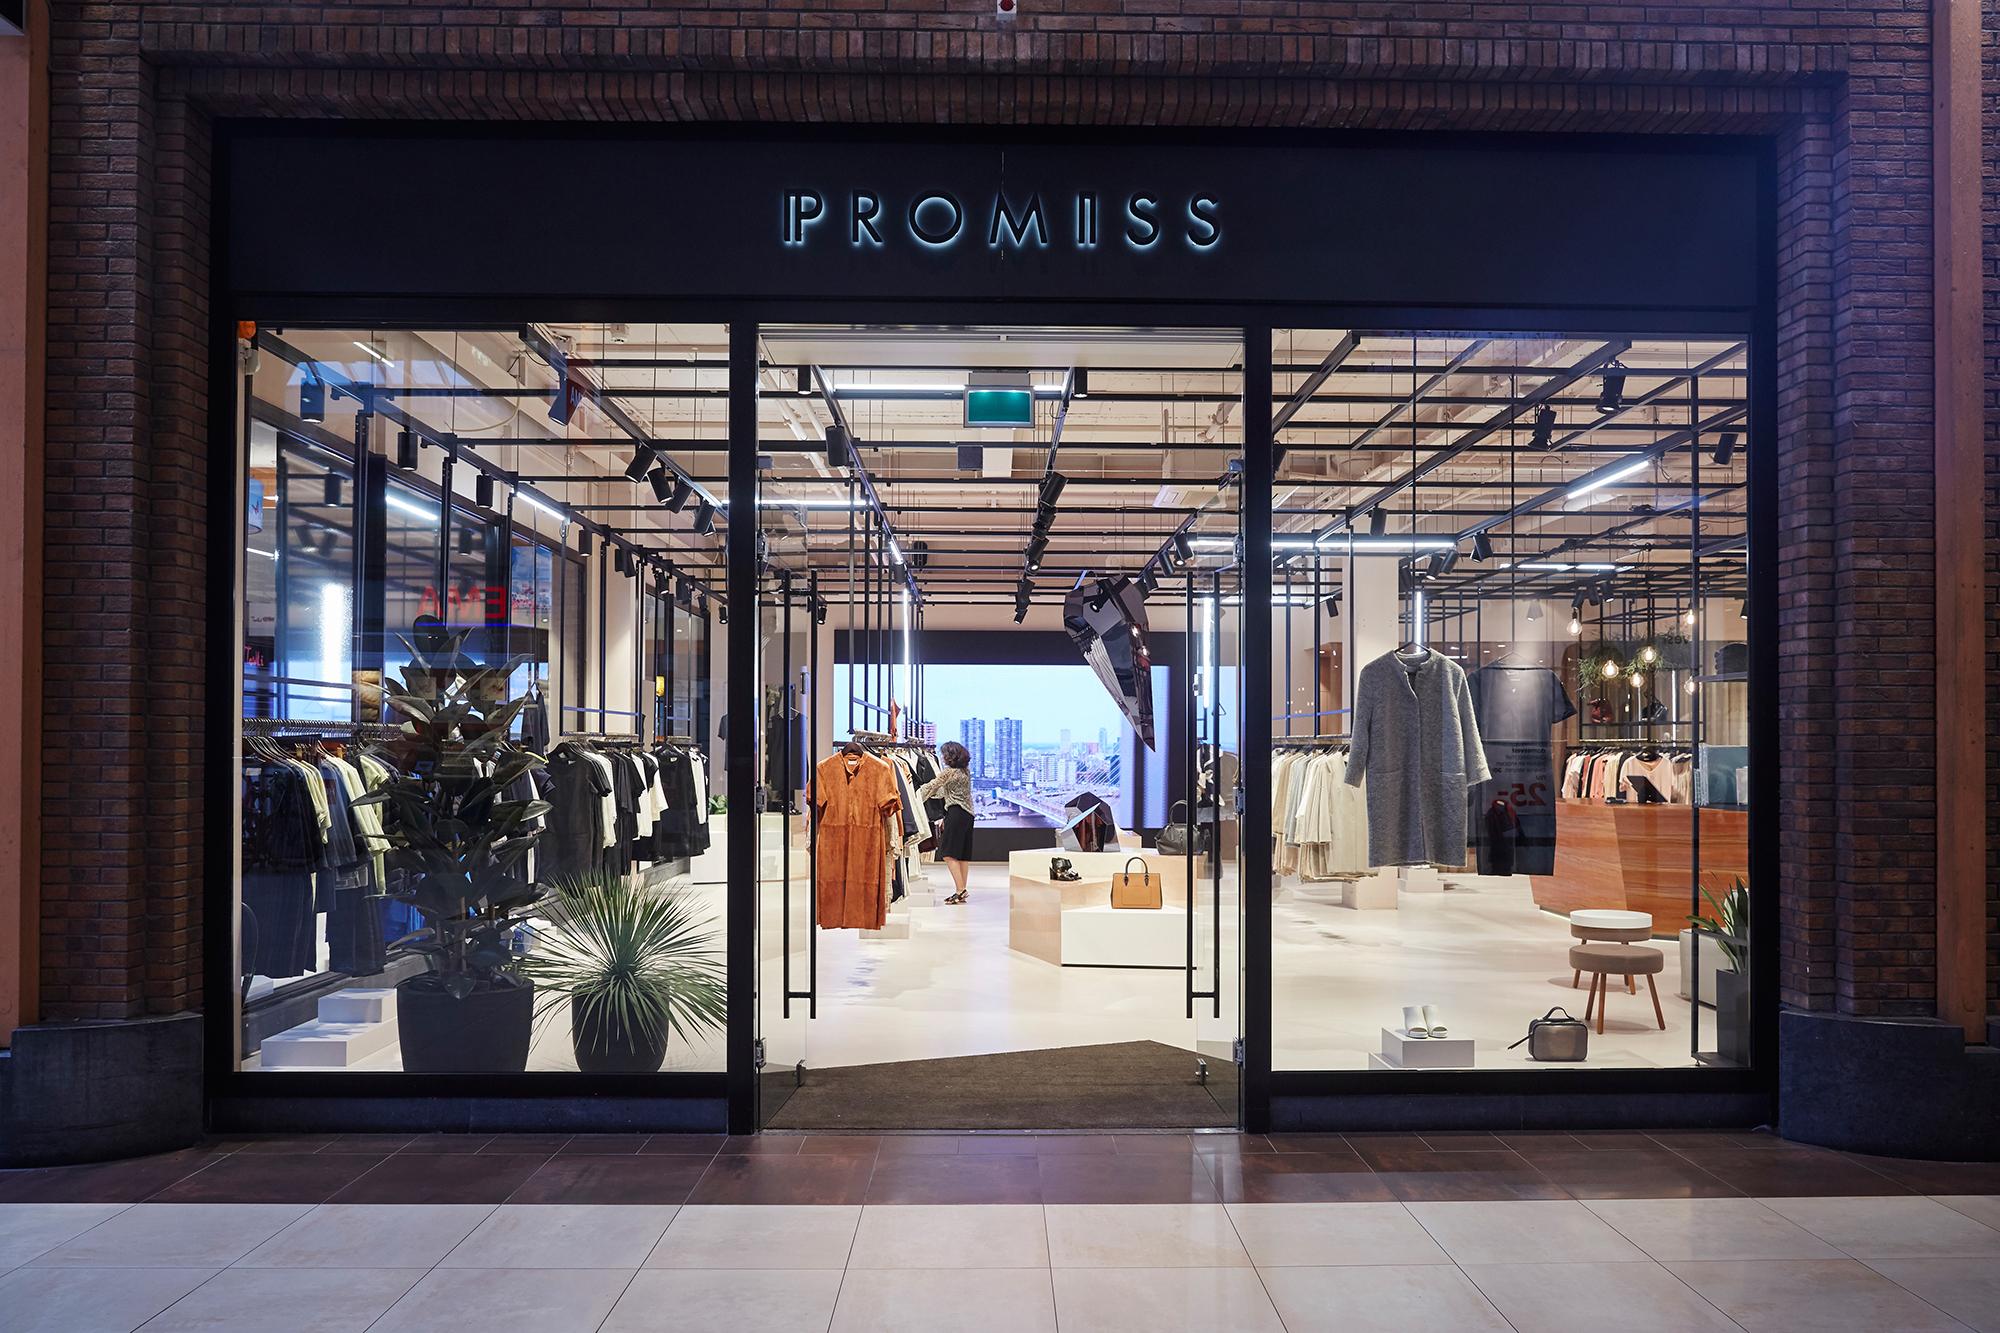 Nest interieur architecten, promiss, winkel